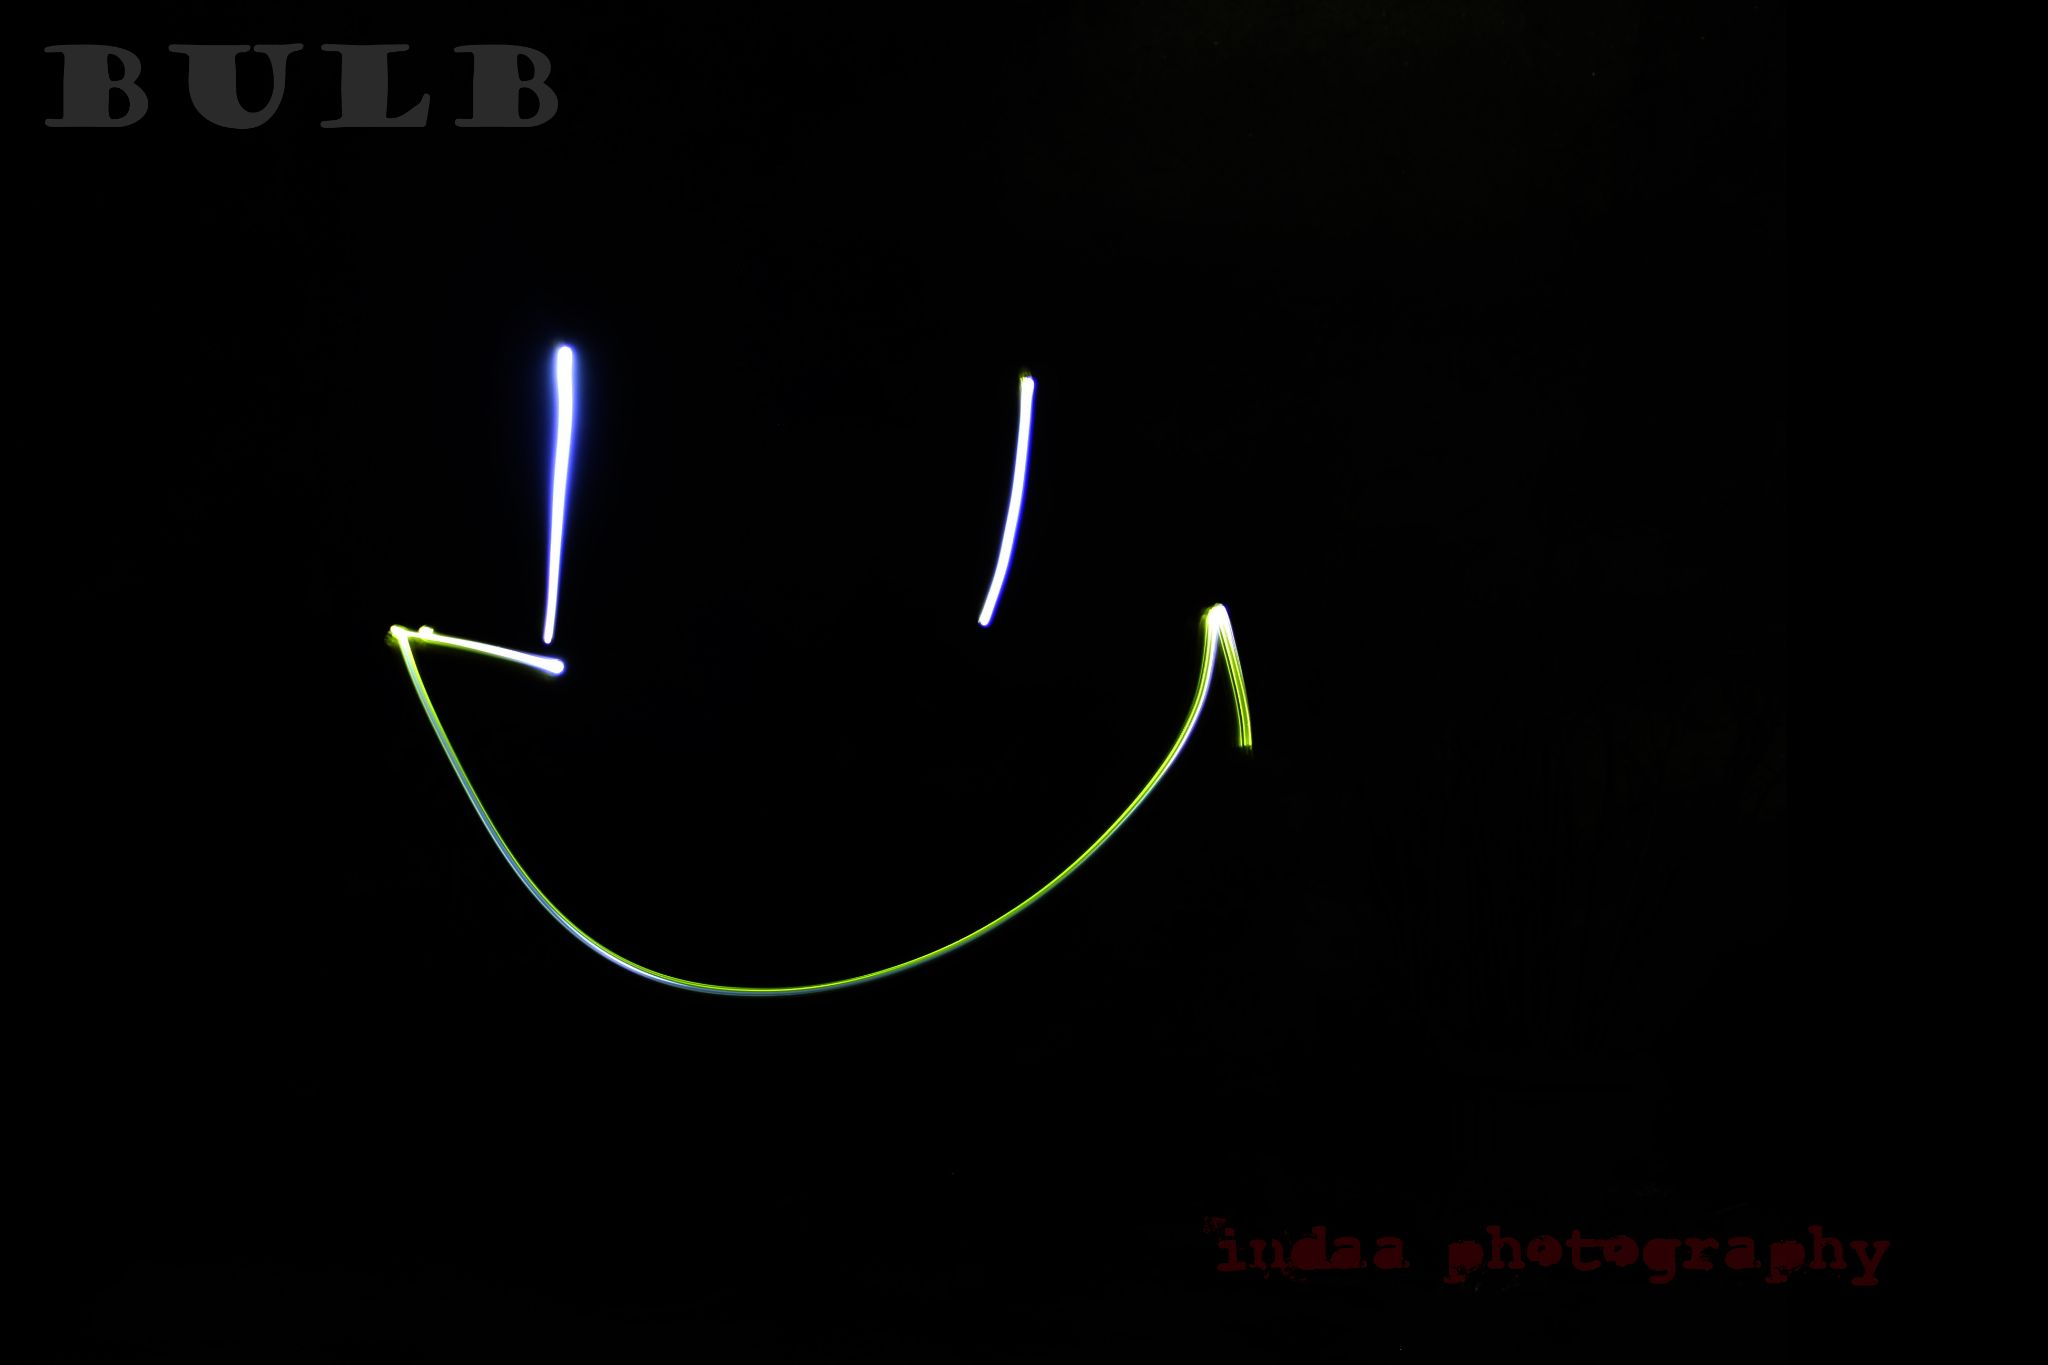 bulb by indaa